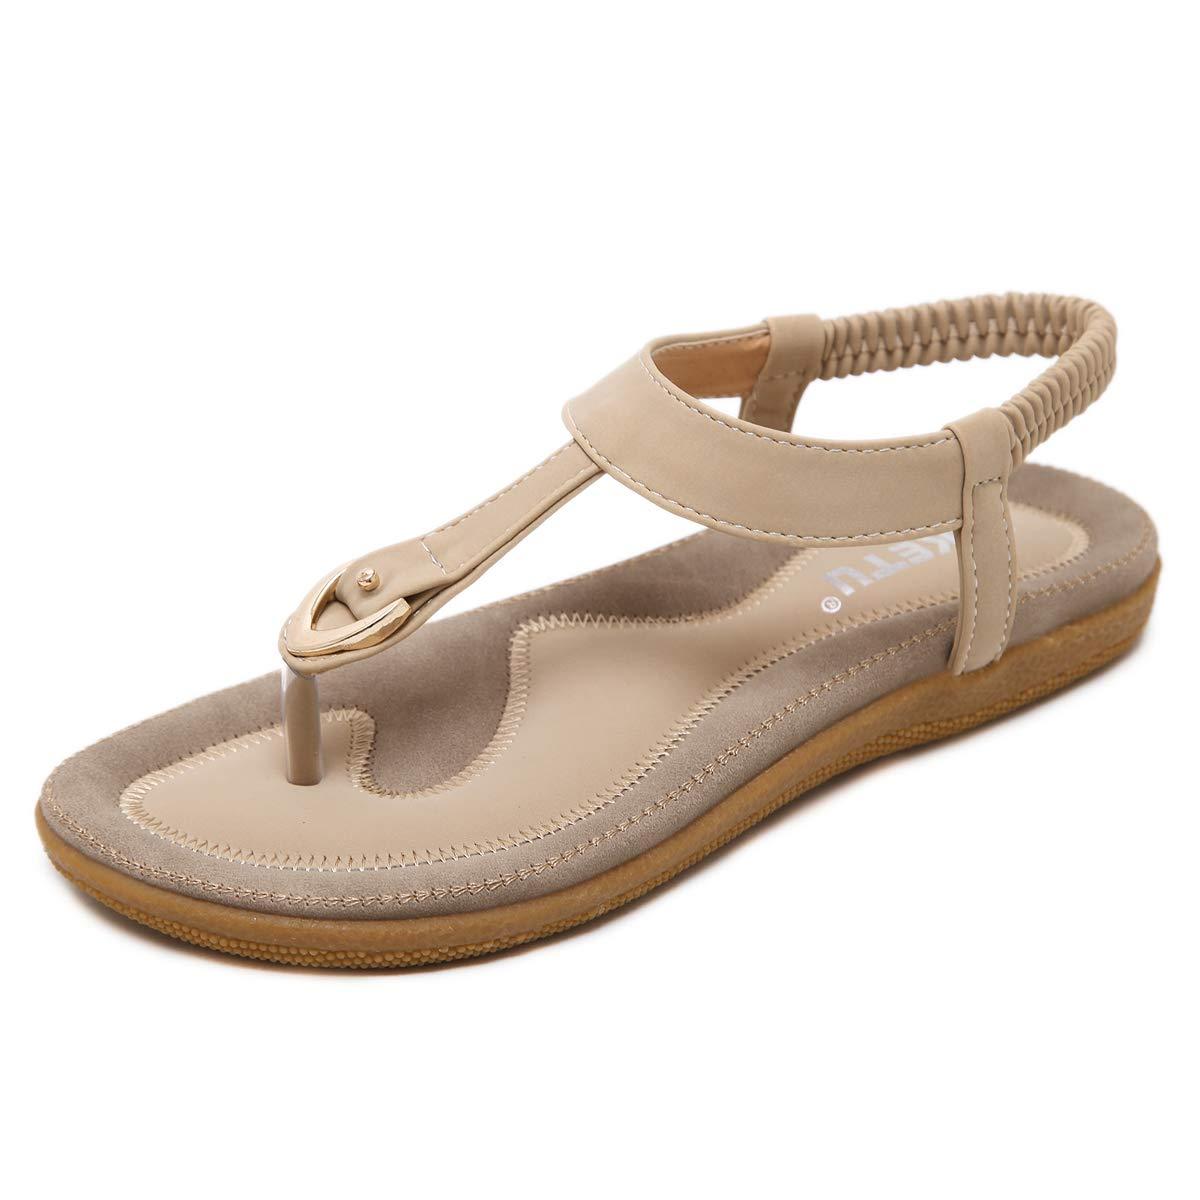 3e64cbbf Amazon.com | Dear Time Slingback T-Strap Flip Flop Women Ankle Strap Thong  Sandals | Flats